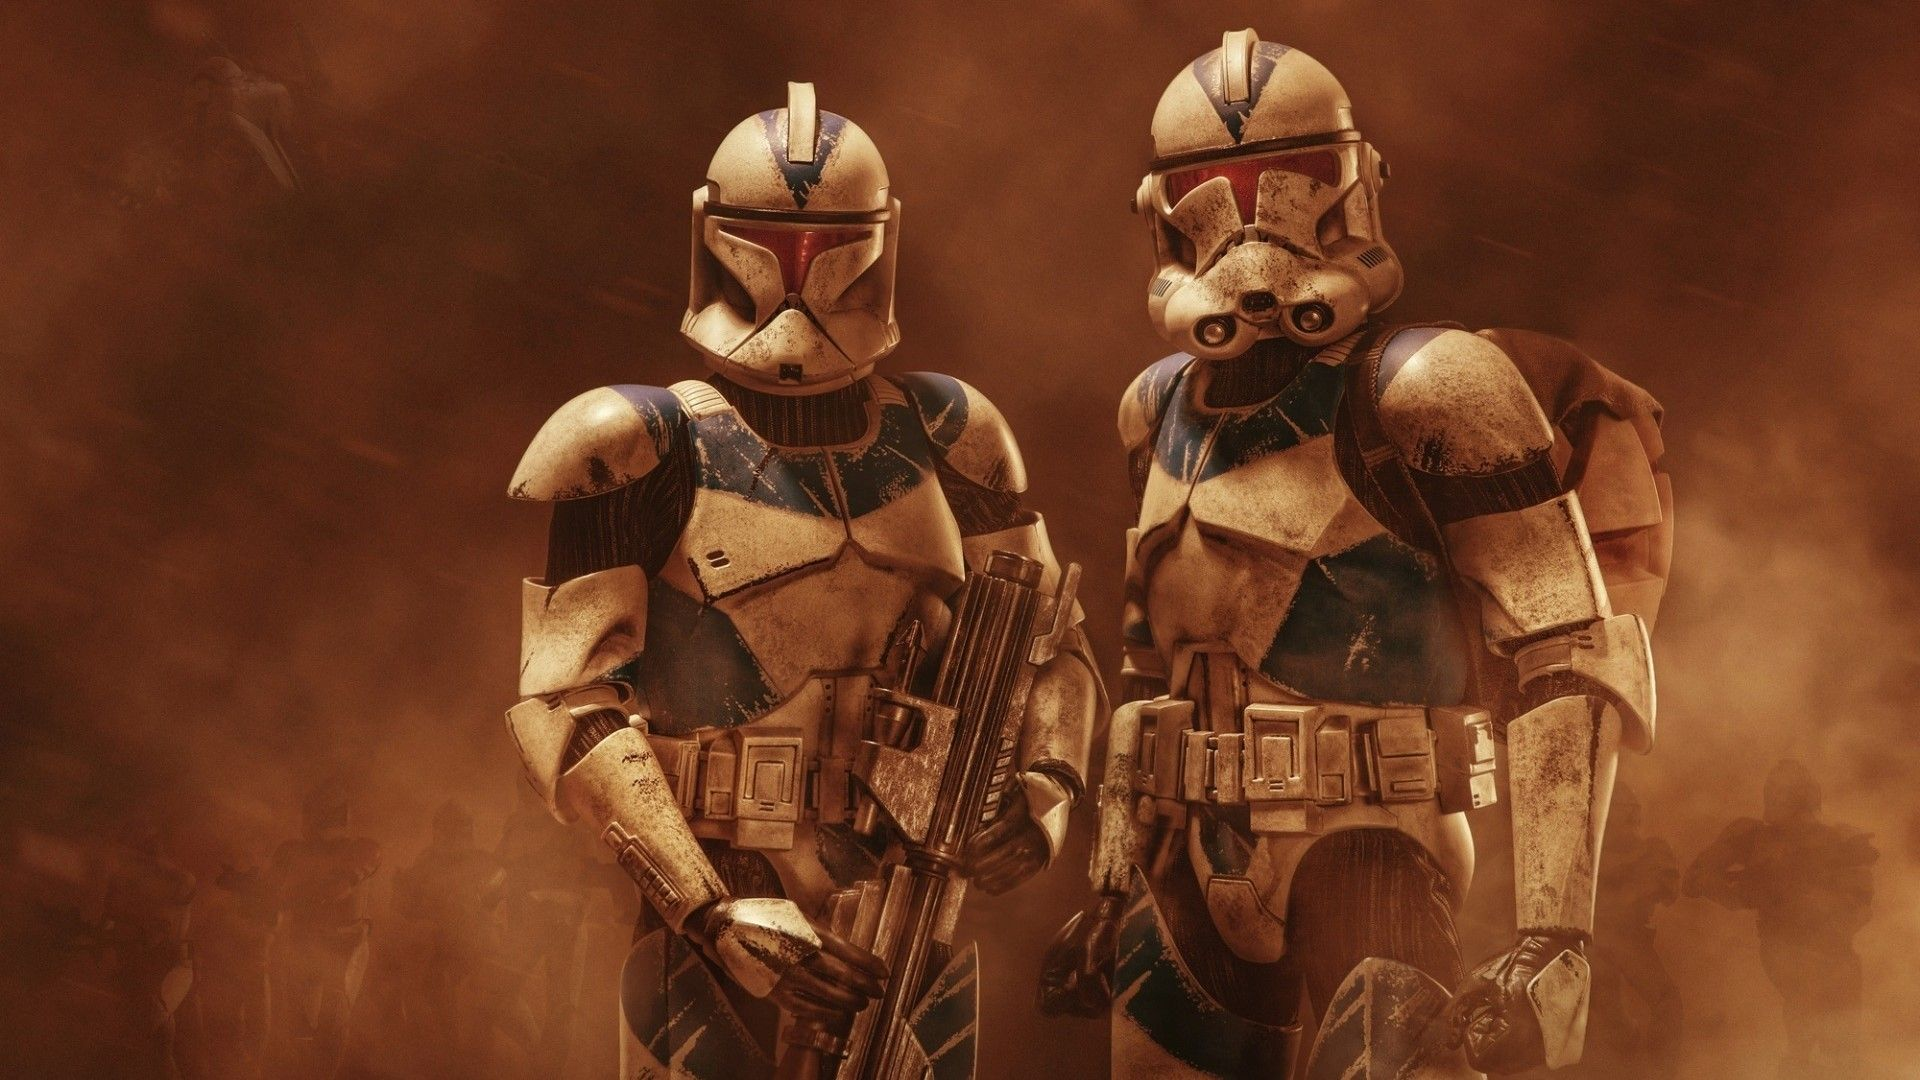 Star War1 Ultimate Star Wars Star Wars Battlefront Star Wars Wallpaper